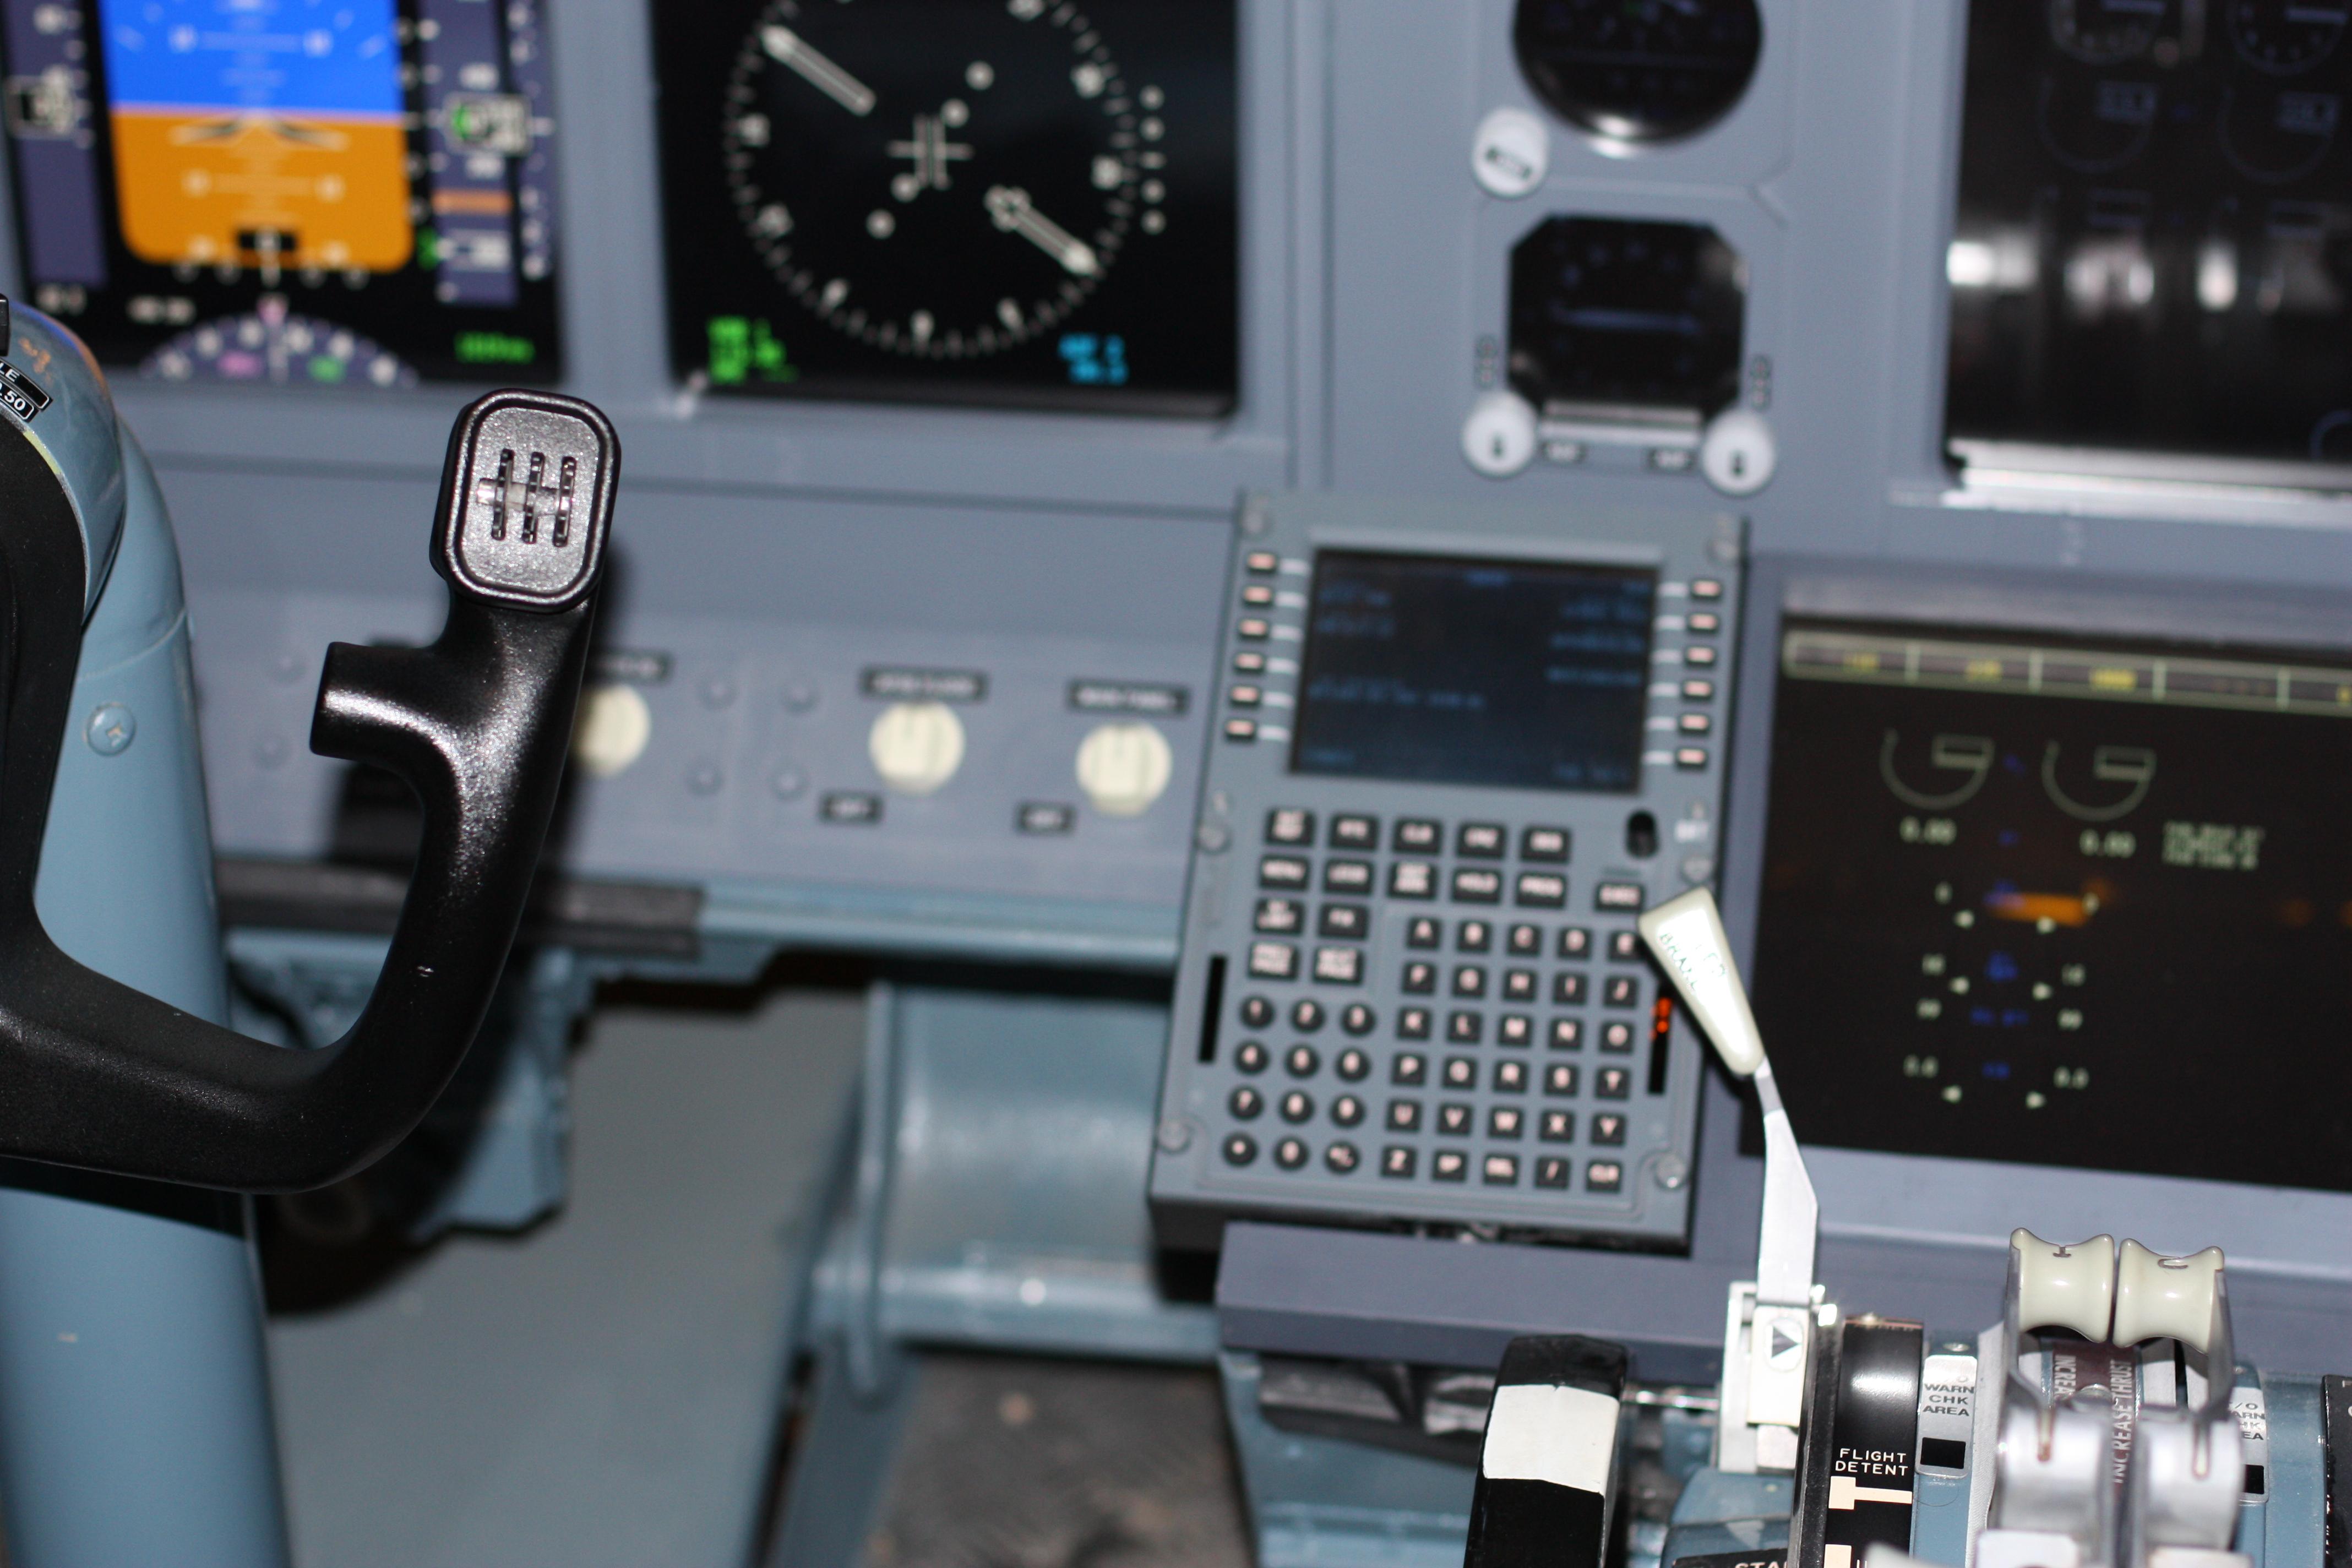 file cockpit of boeing 737 700 flight simulator in berlin img 0134